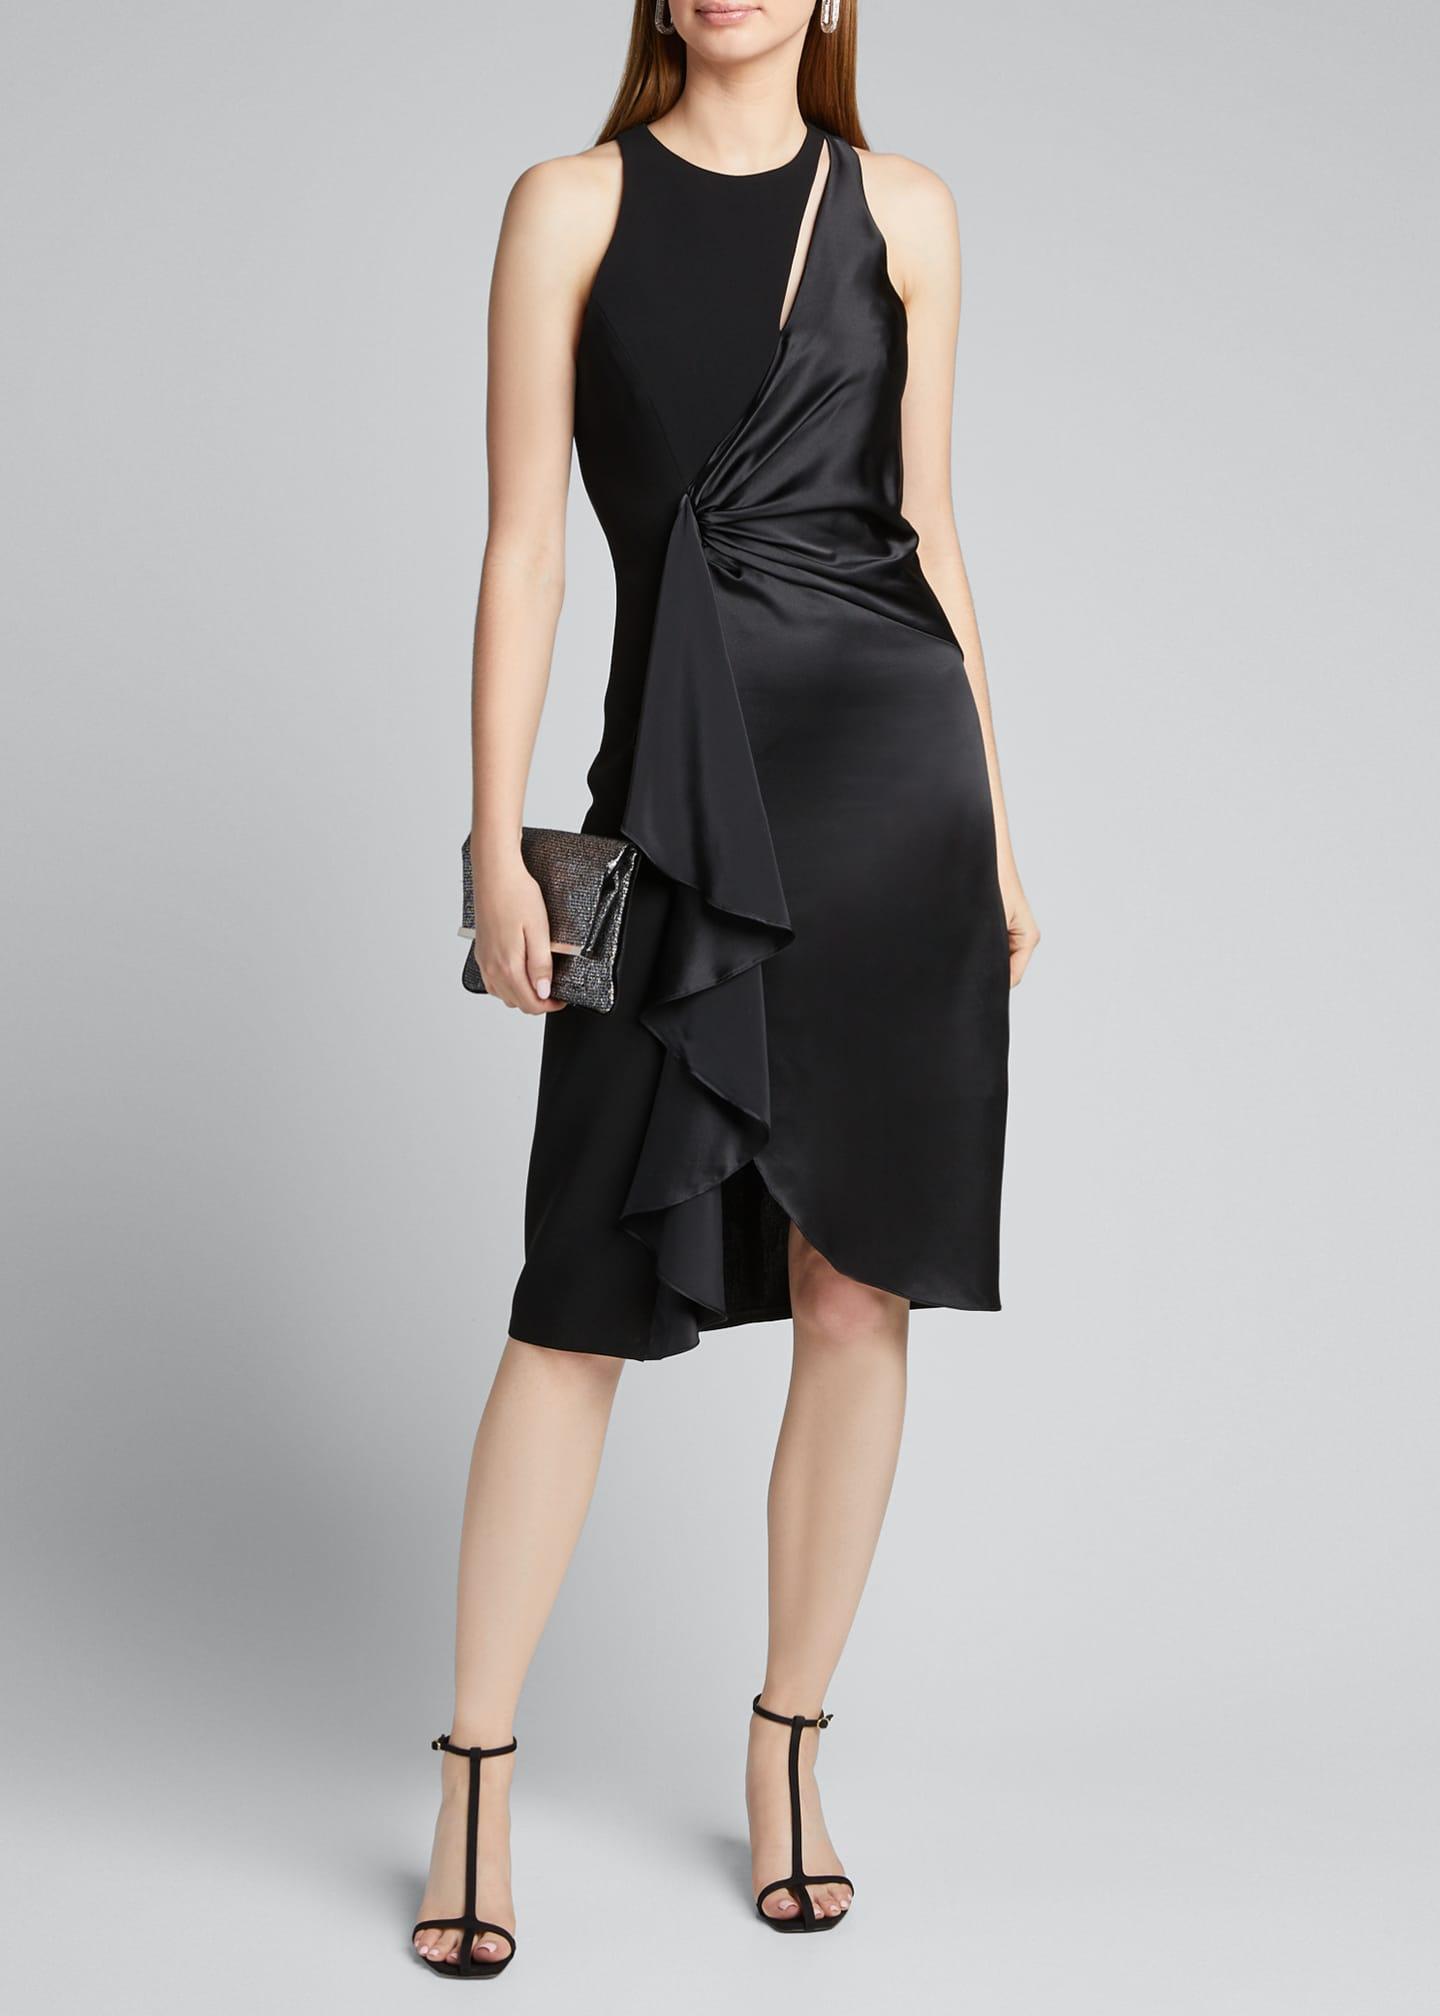 Clemency Drape Front Satin Combo Dress by Cinq A Sept